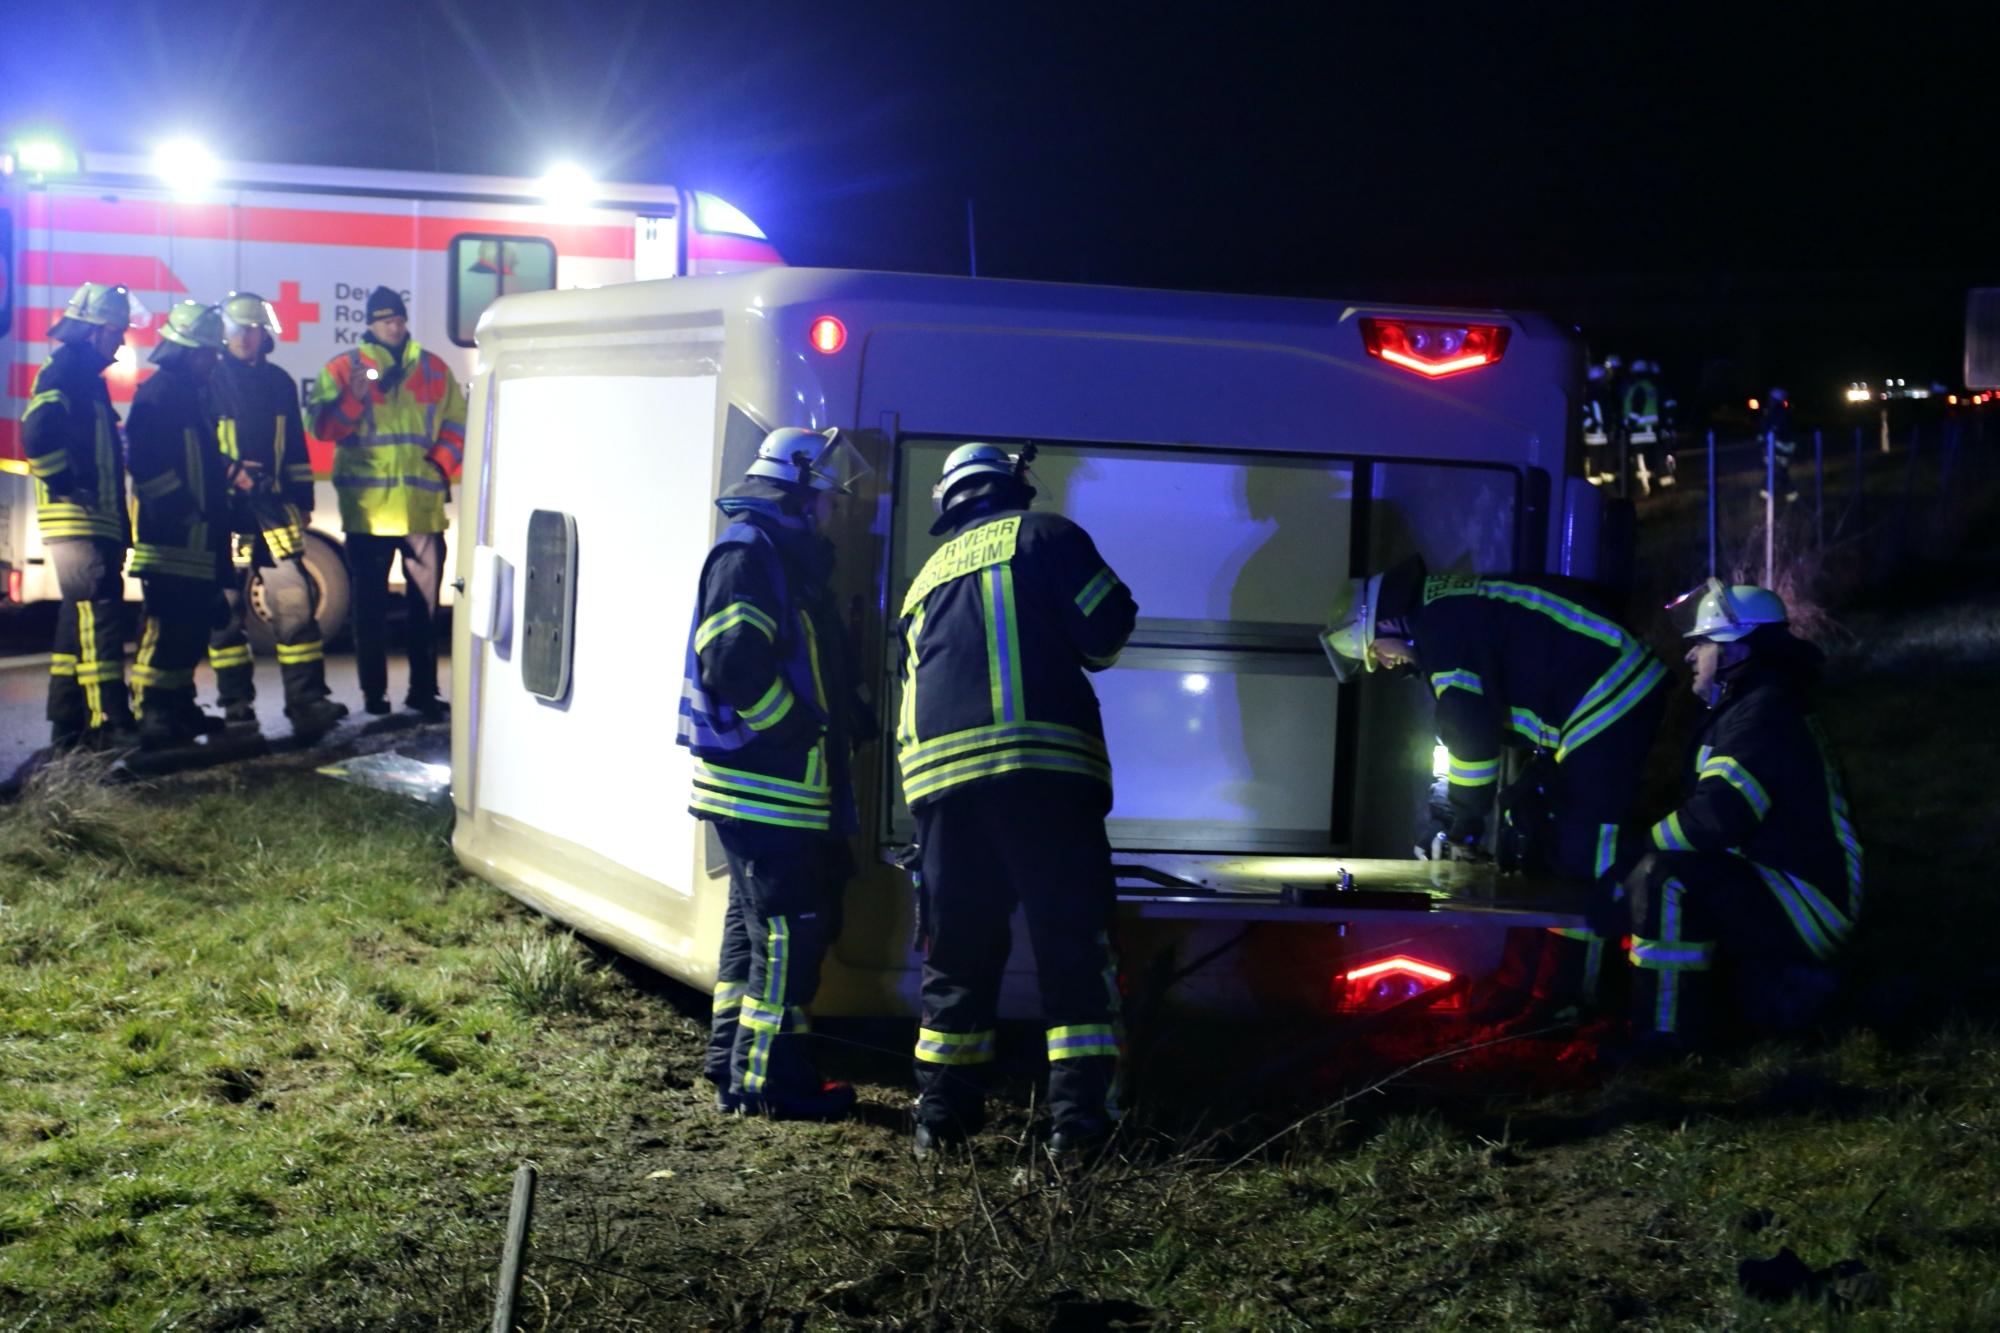 2020-03-10_A7_Dettingen_Berkheim_Unfall_Pferdetransporter_Feuerwehr_IMG_6339